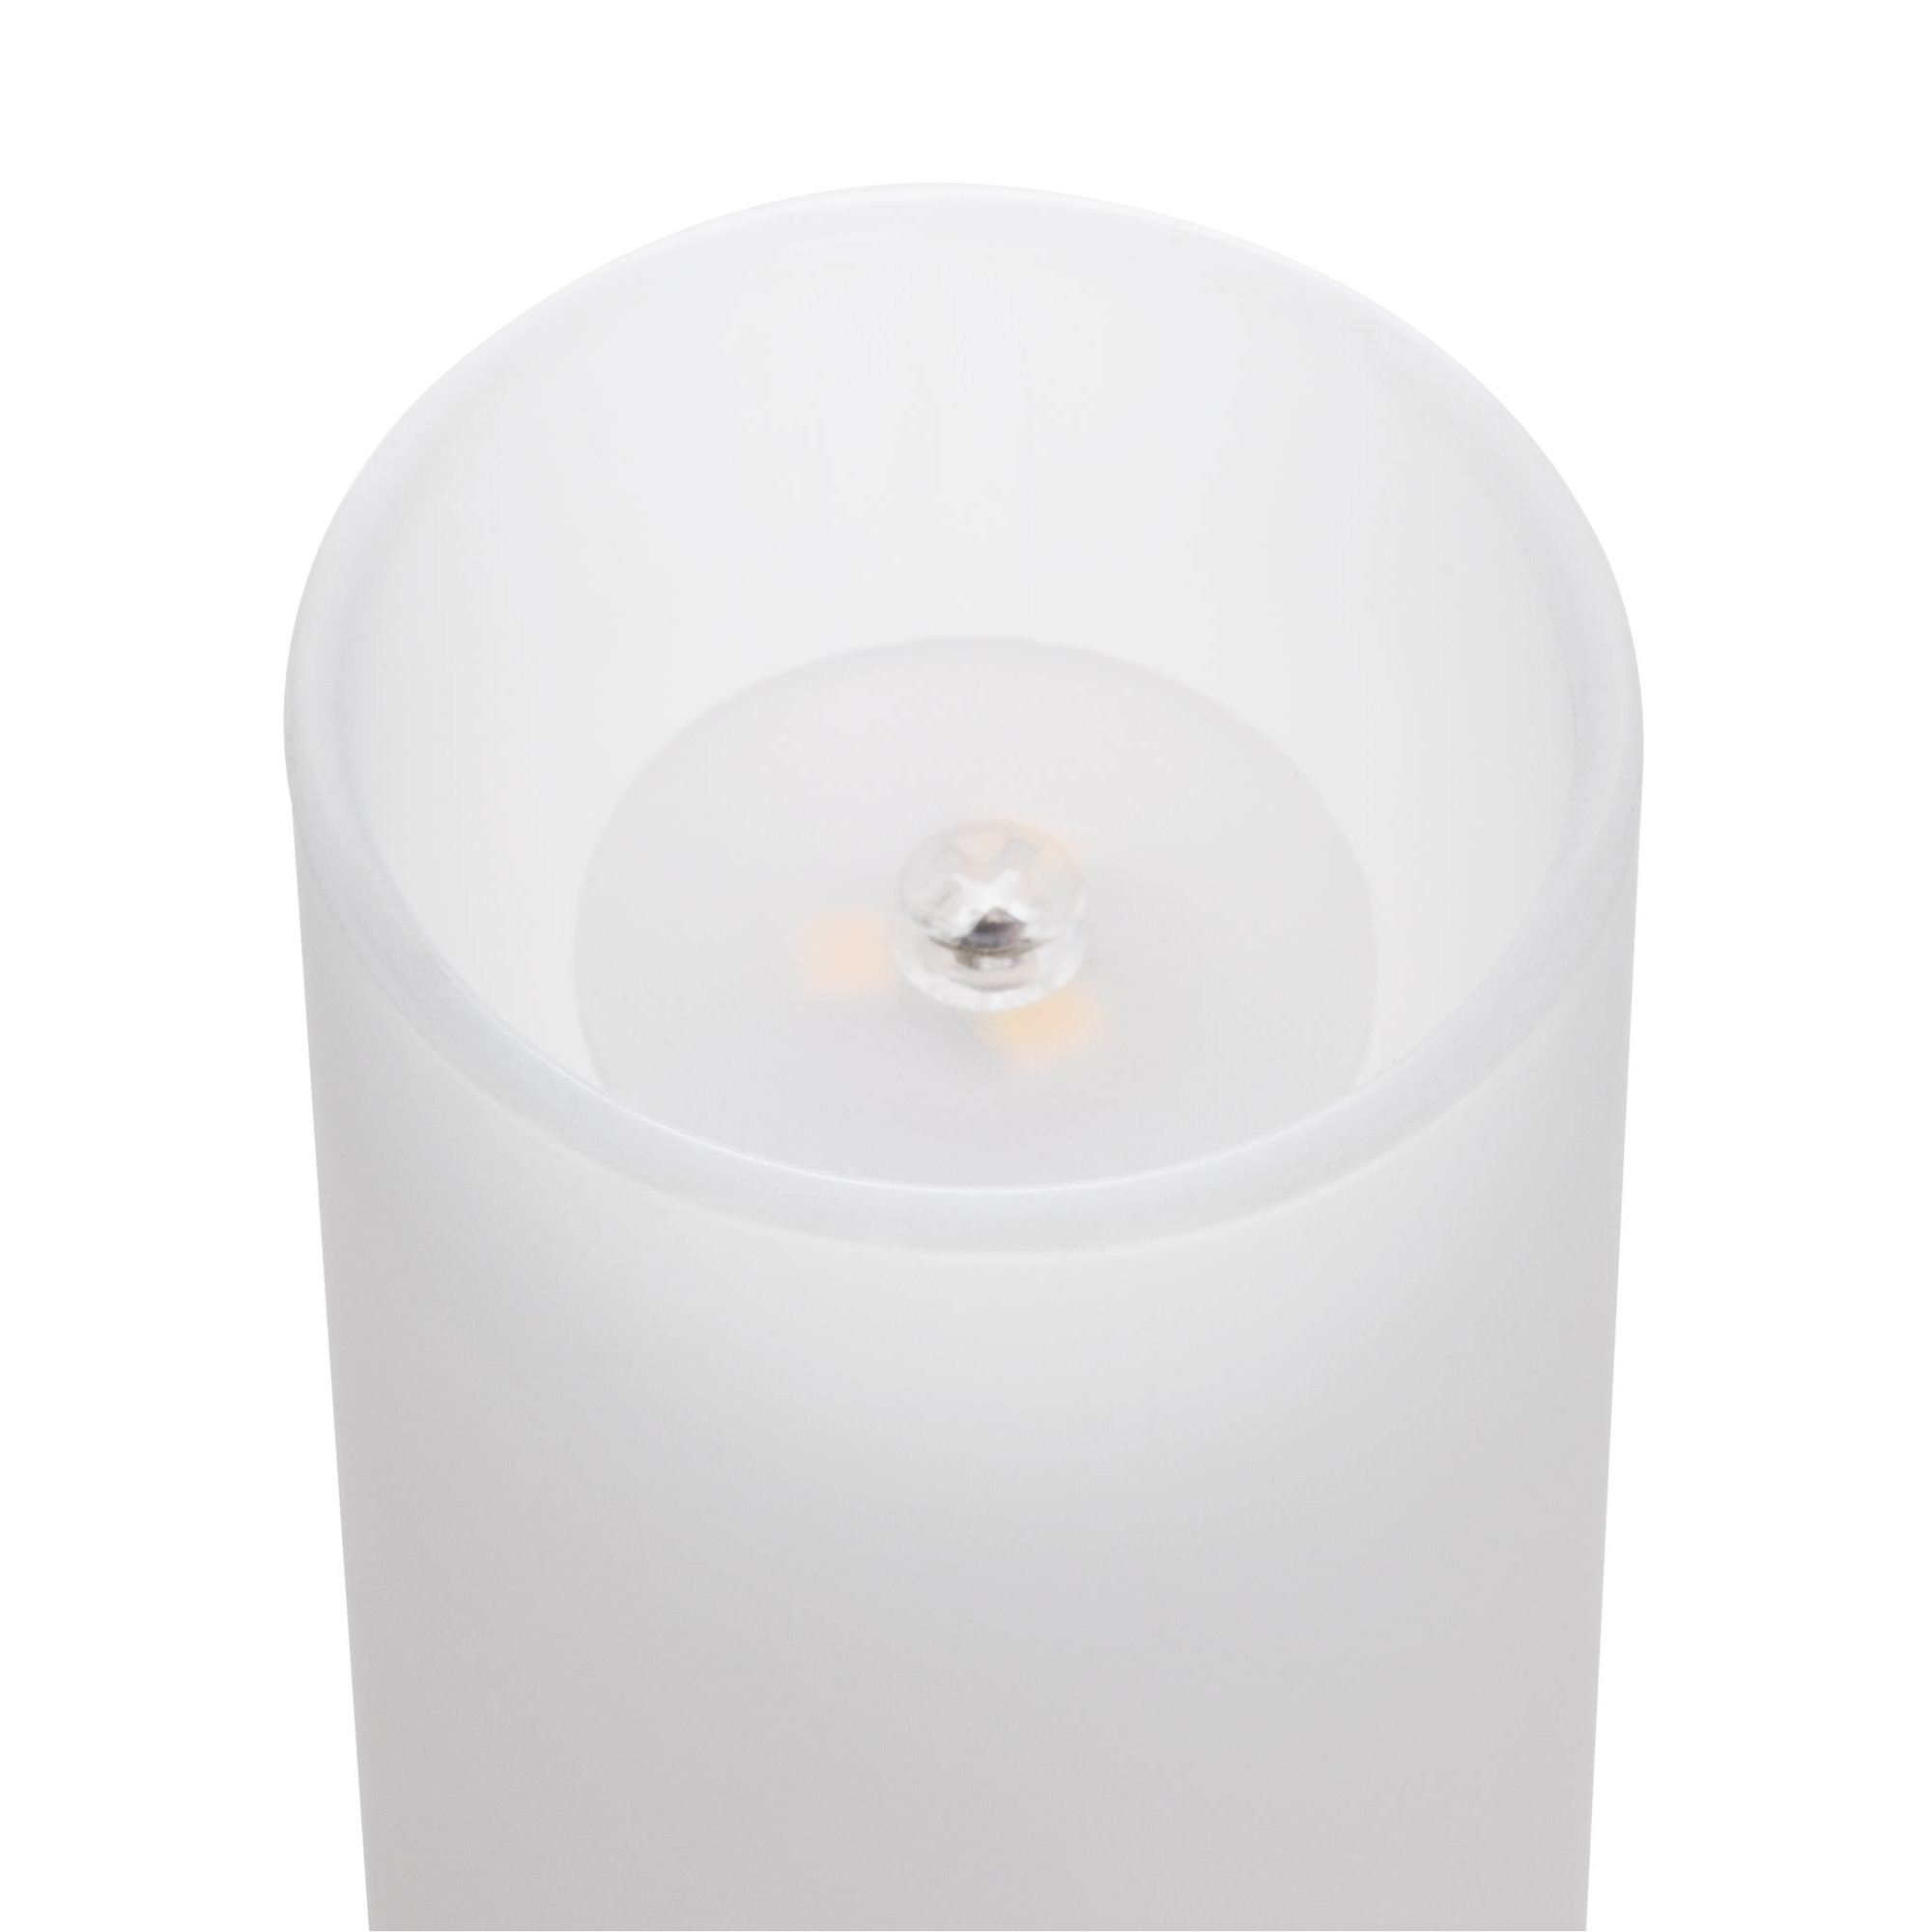 Лампа светодиодная Paulmann Deco Pipe Трубка 6Вт 520лм 2700K E14 230В Сатин Дим. 28435.